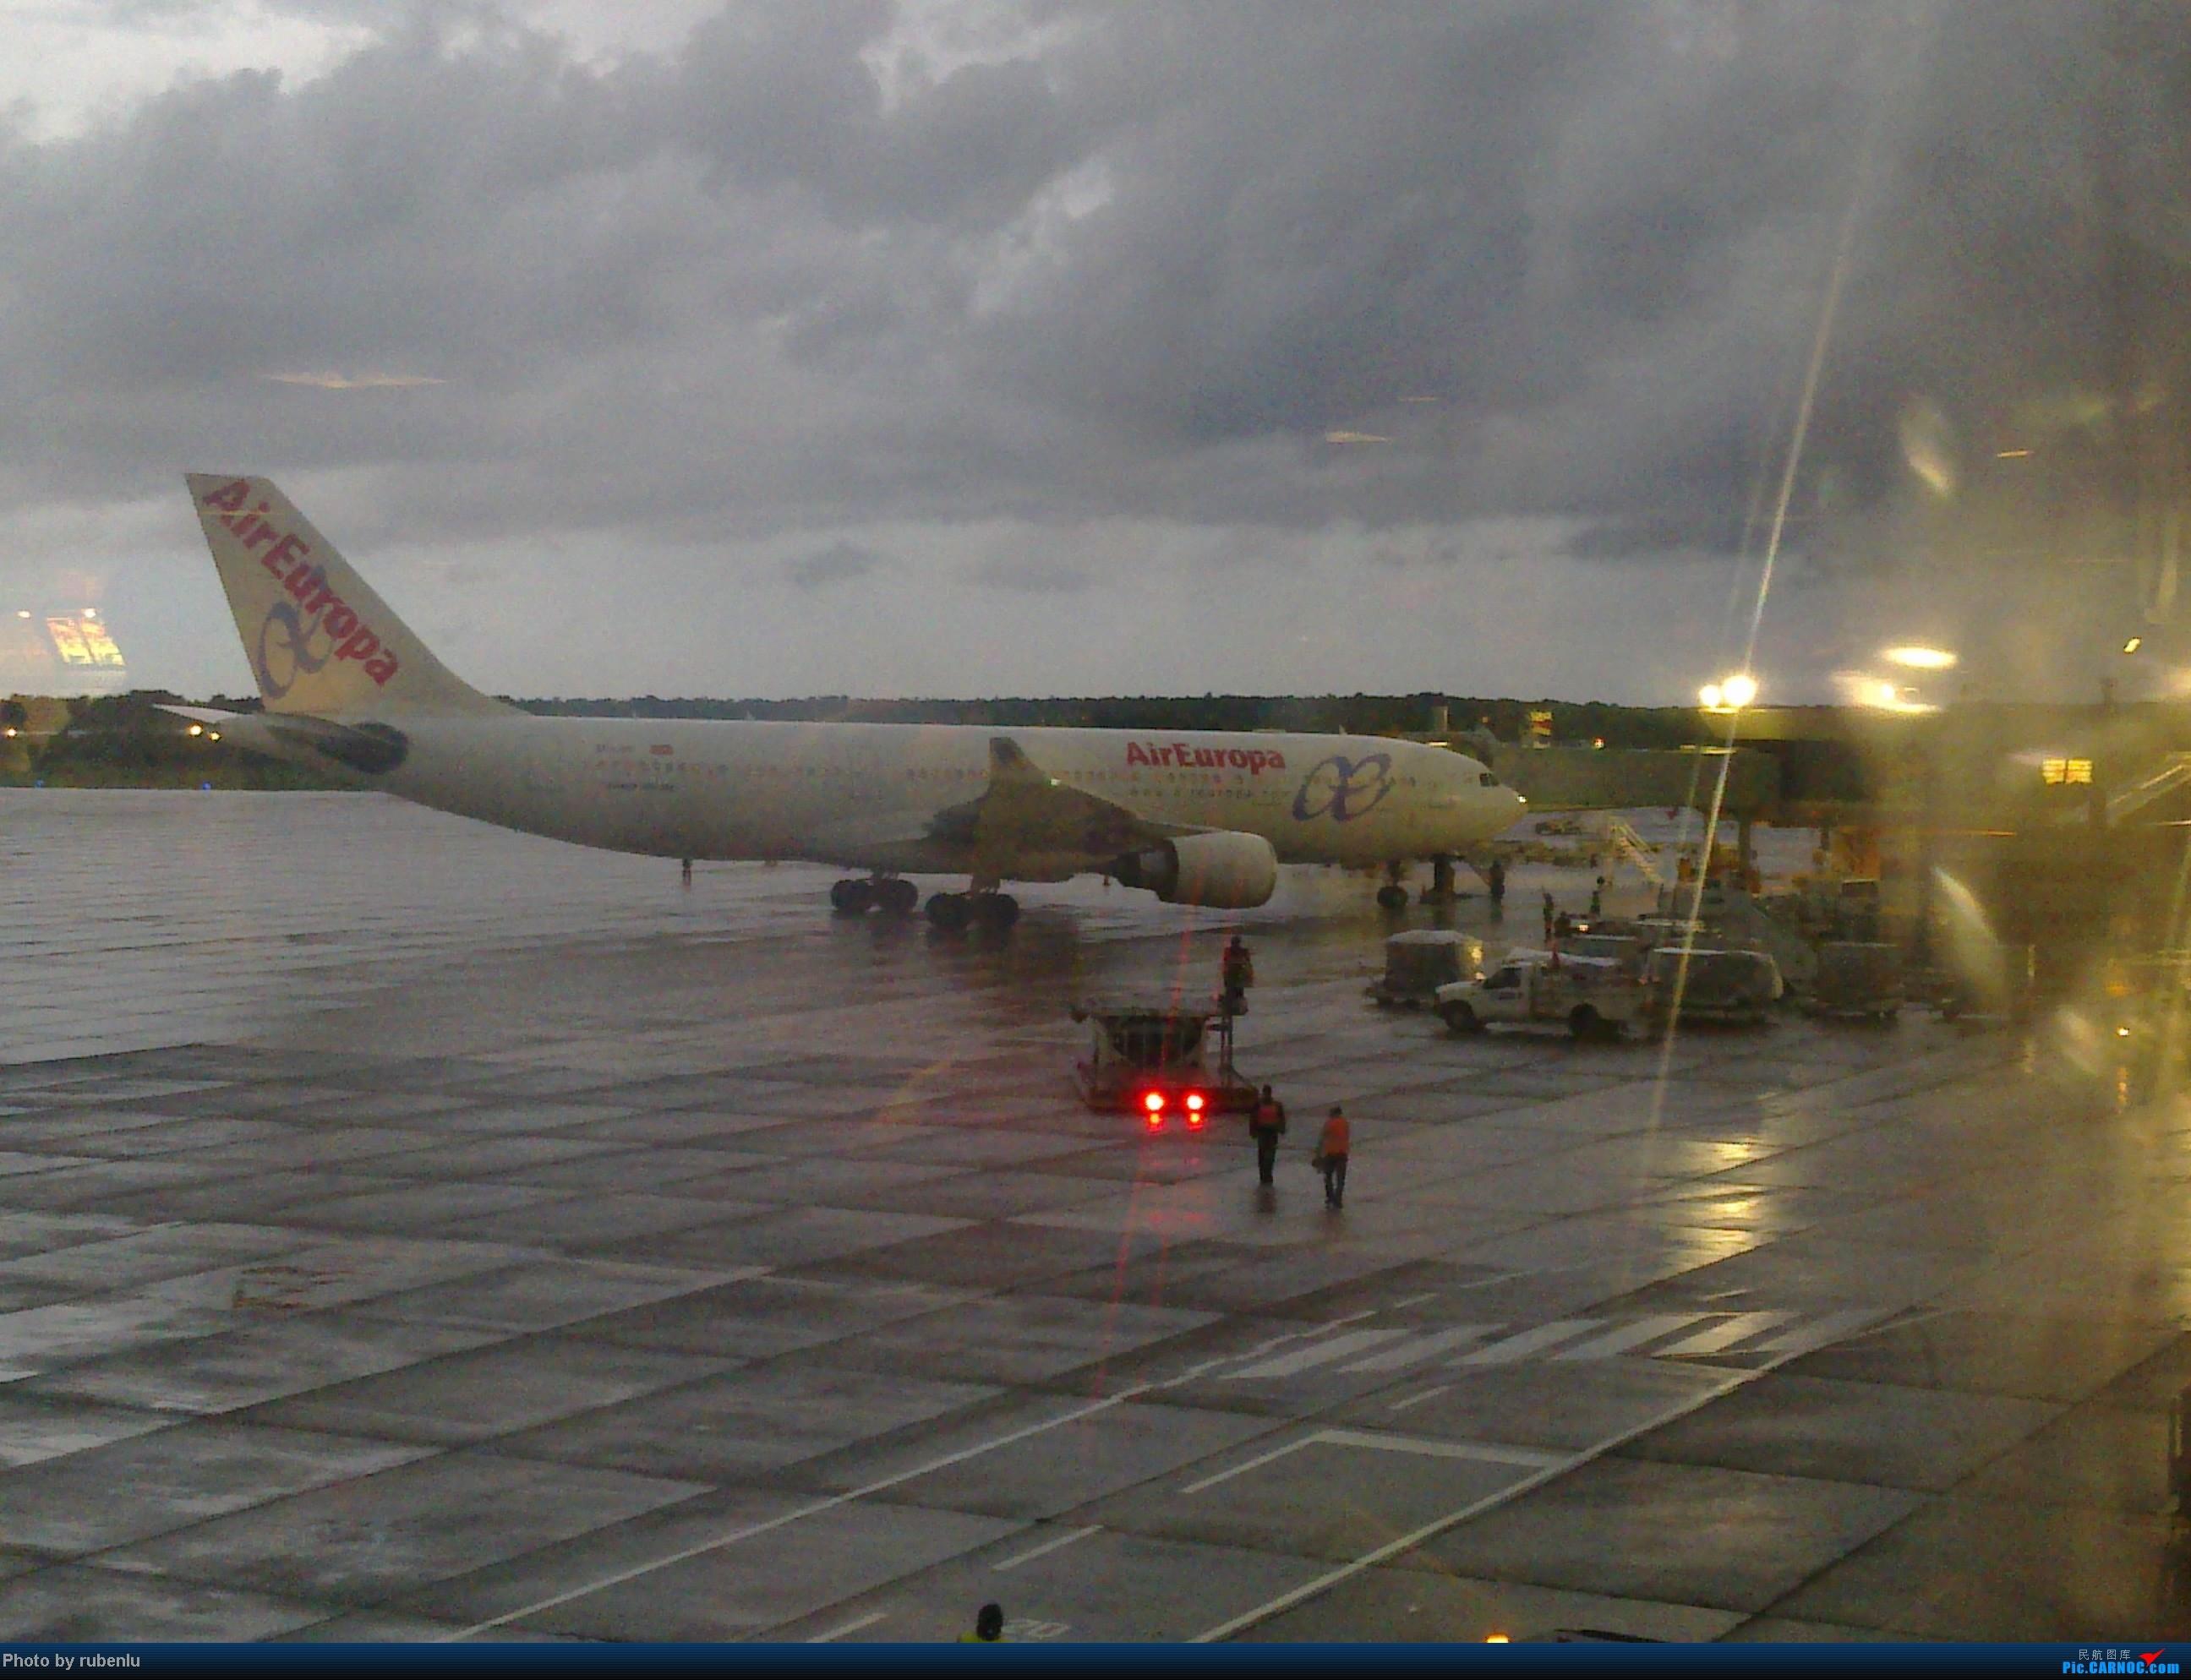 Re:多明尼加共和国santo domingo 机场